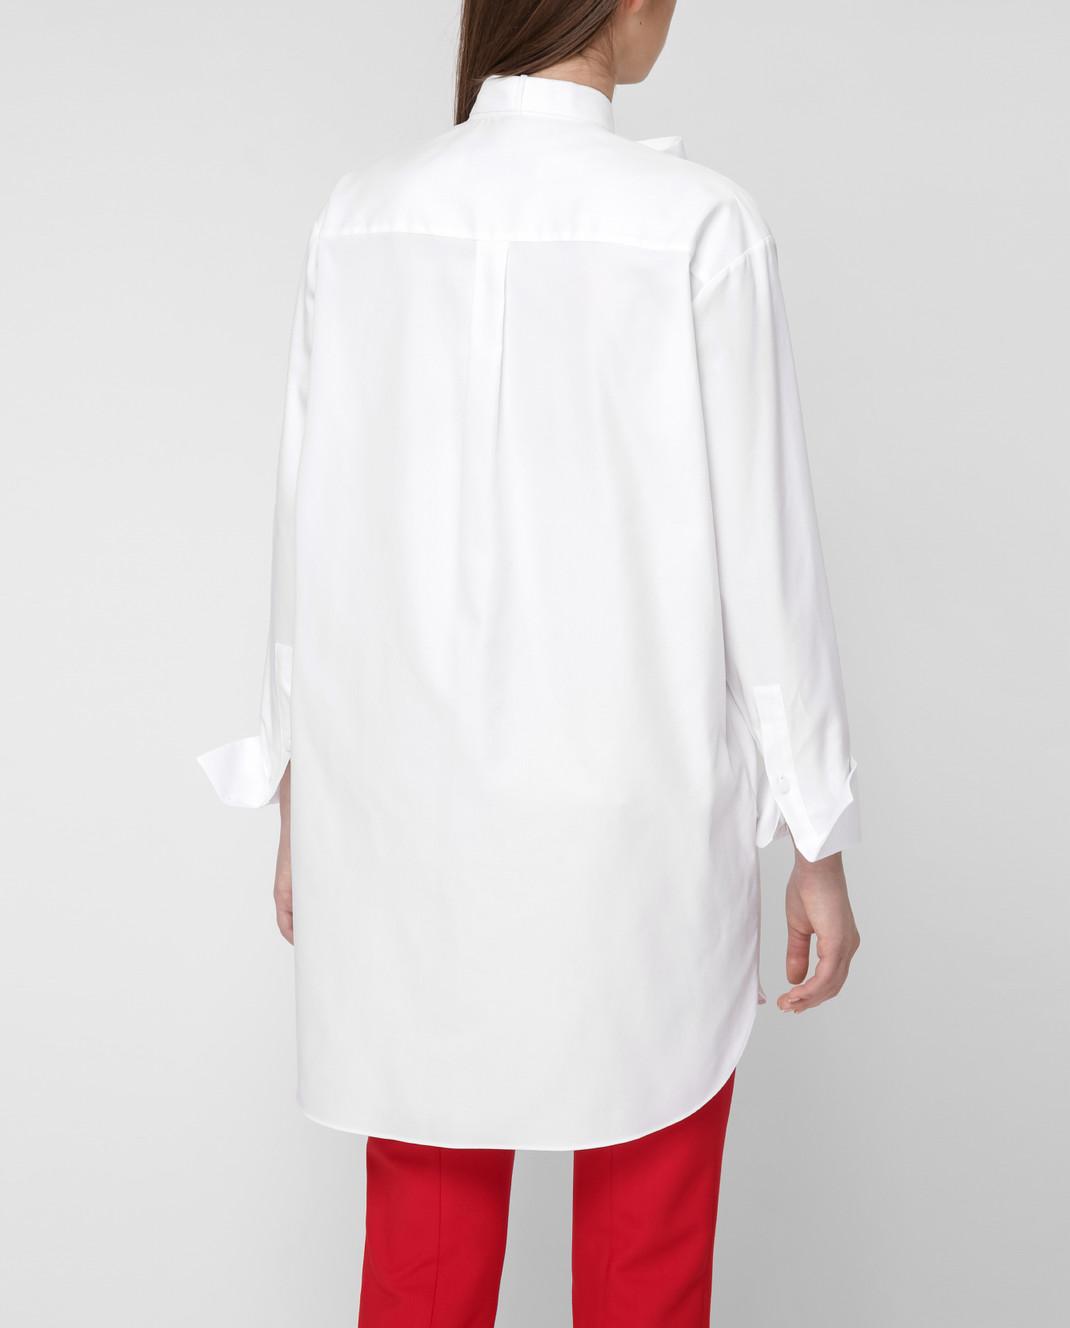 Valentino Белая рубашка RB3AB12U4F4 изображение 4